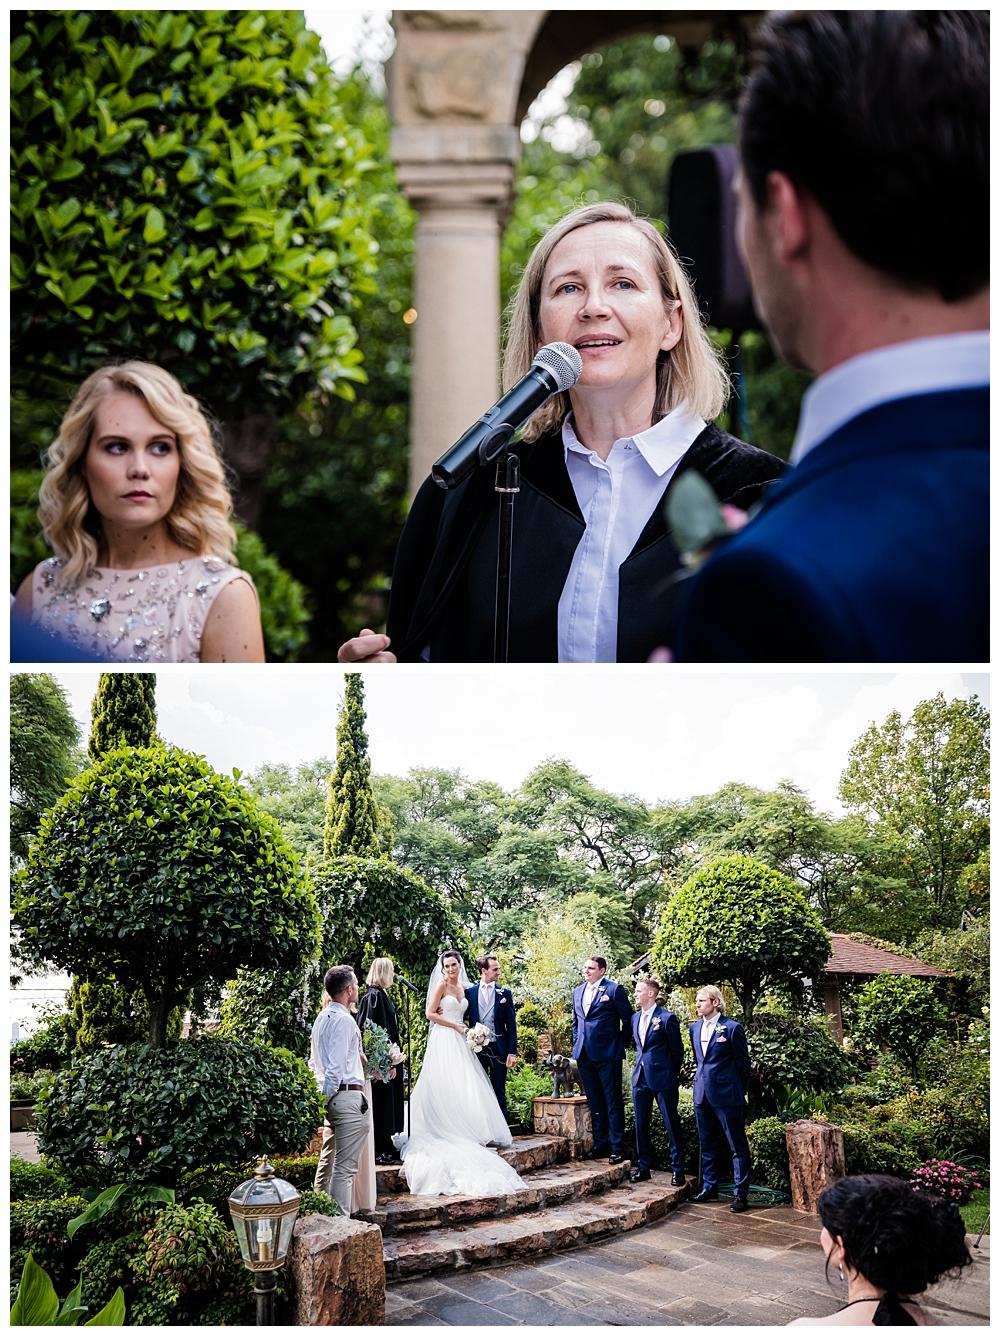 Best_Wedding_Photographer_AlexanderSmith_1258.jpg